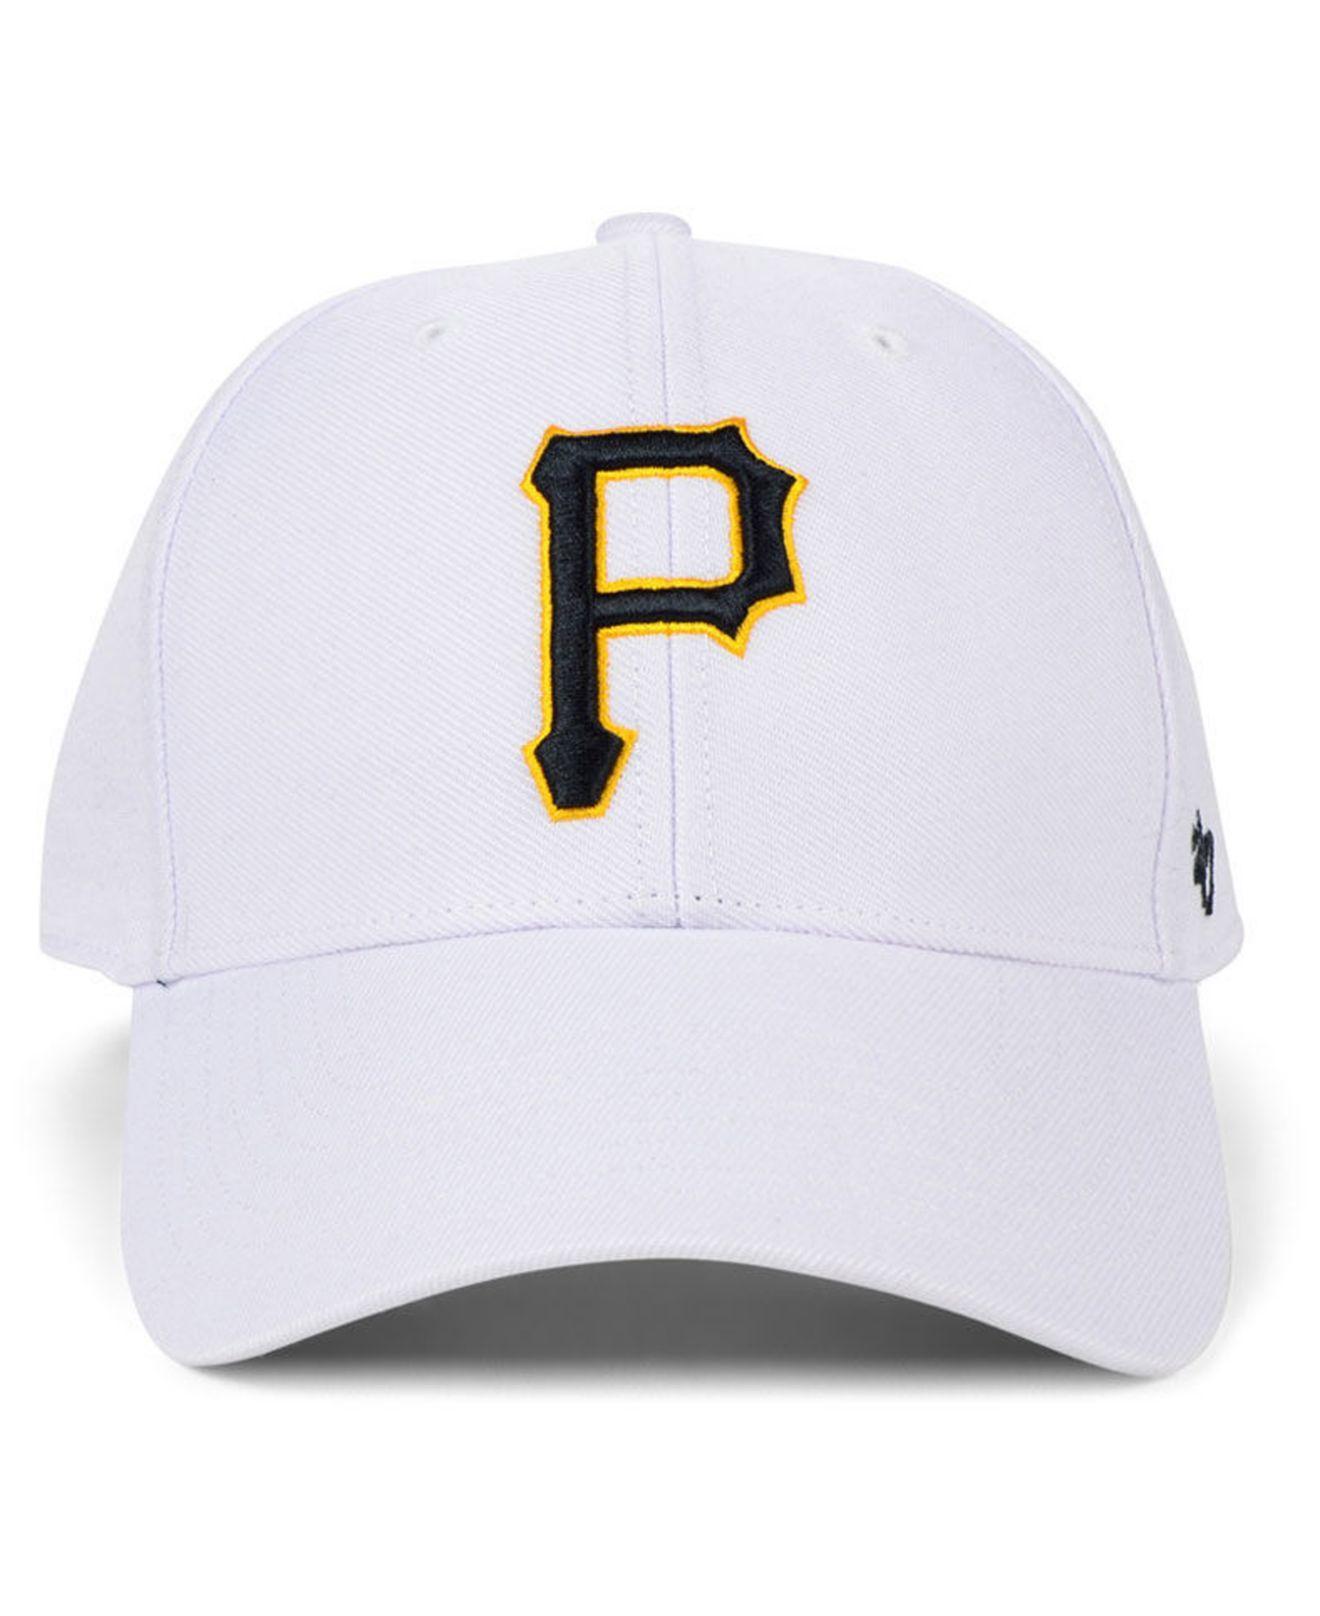 33051f079dc01 Lyst - 47 Brand Pittsburgh Pirates White Mvp Cap in White